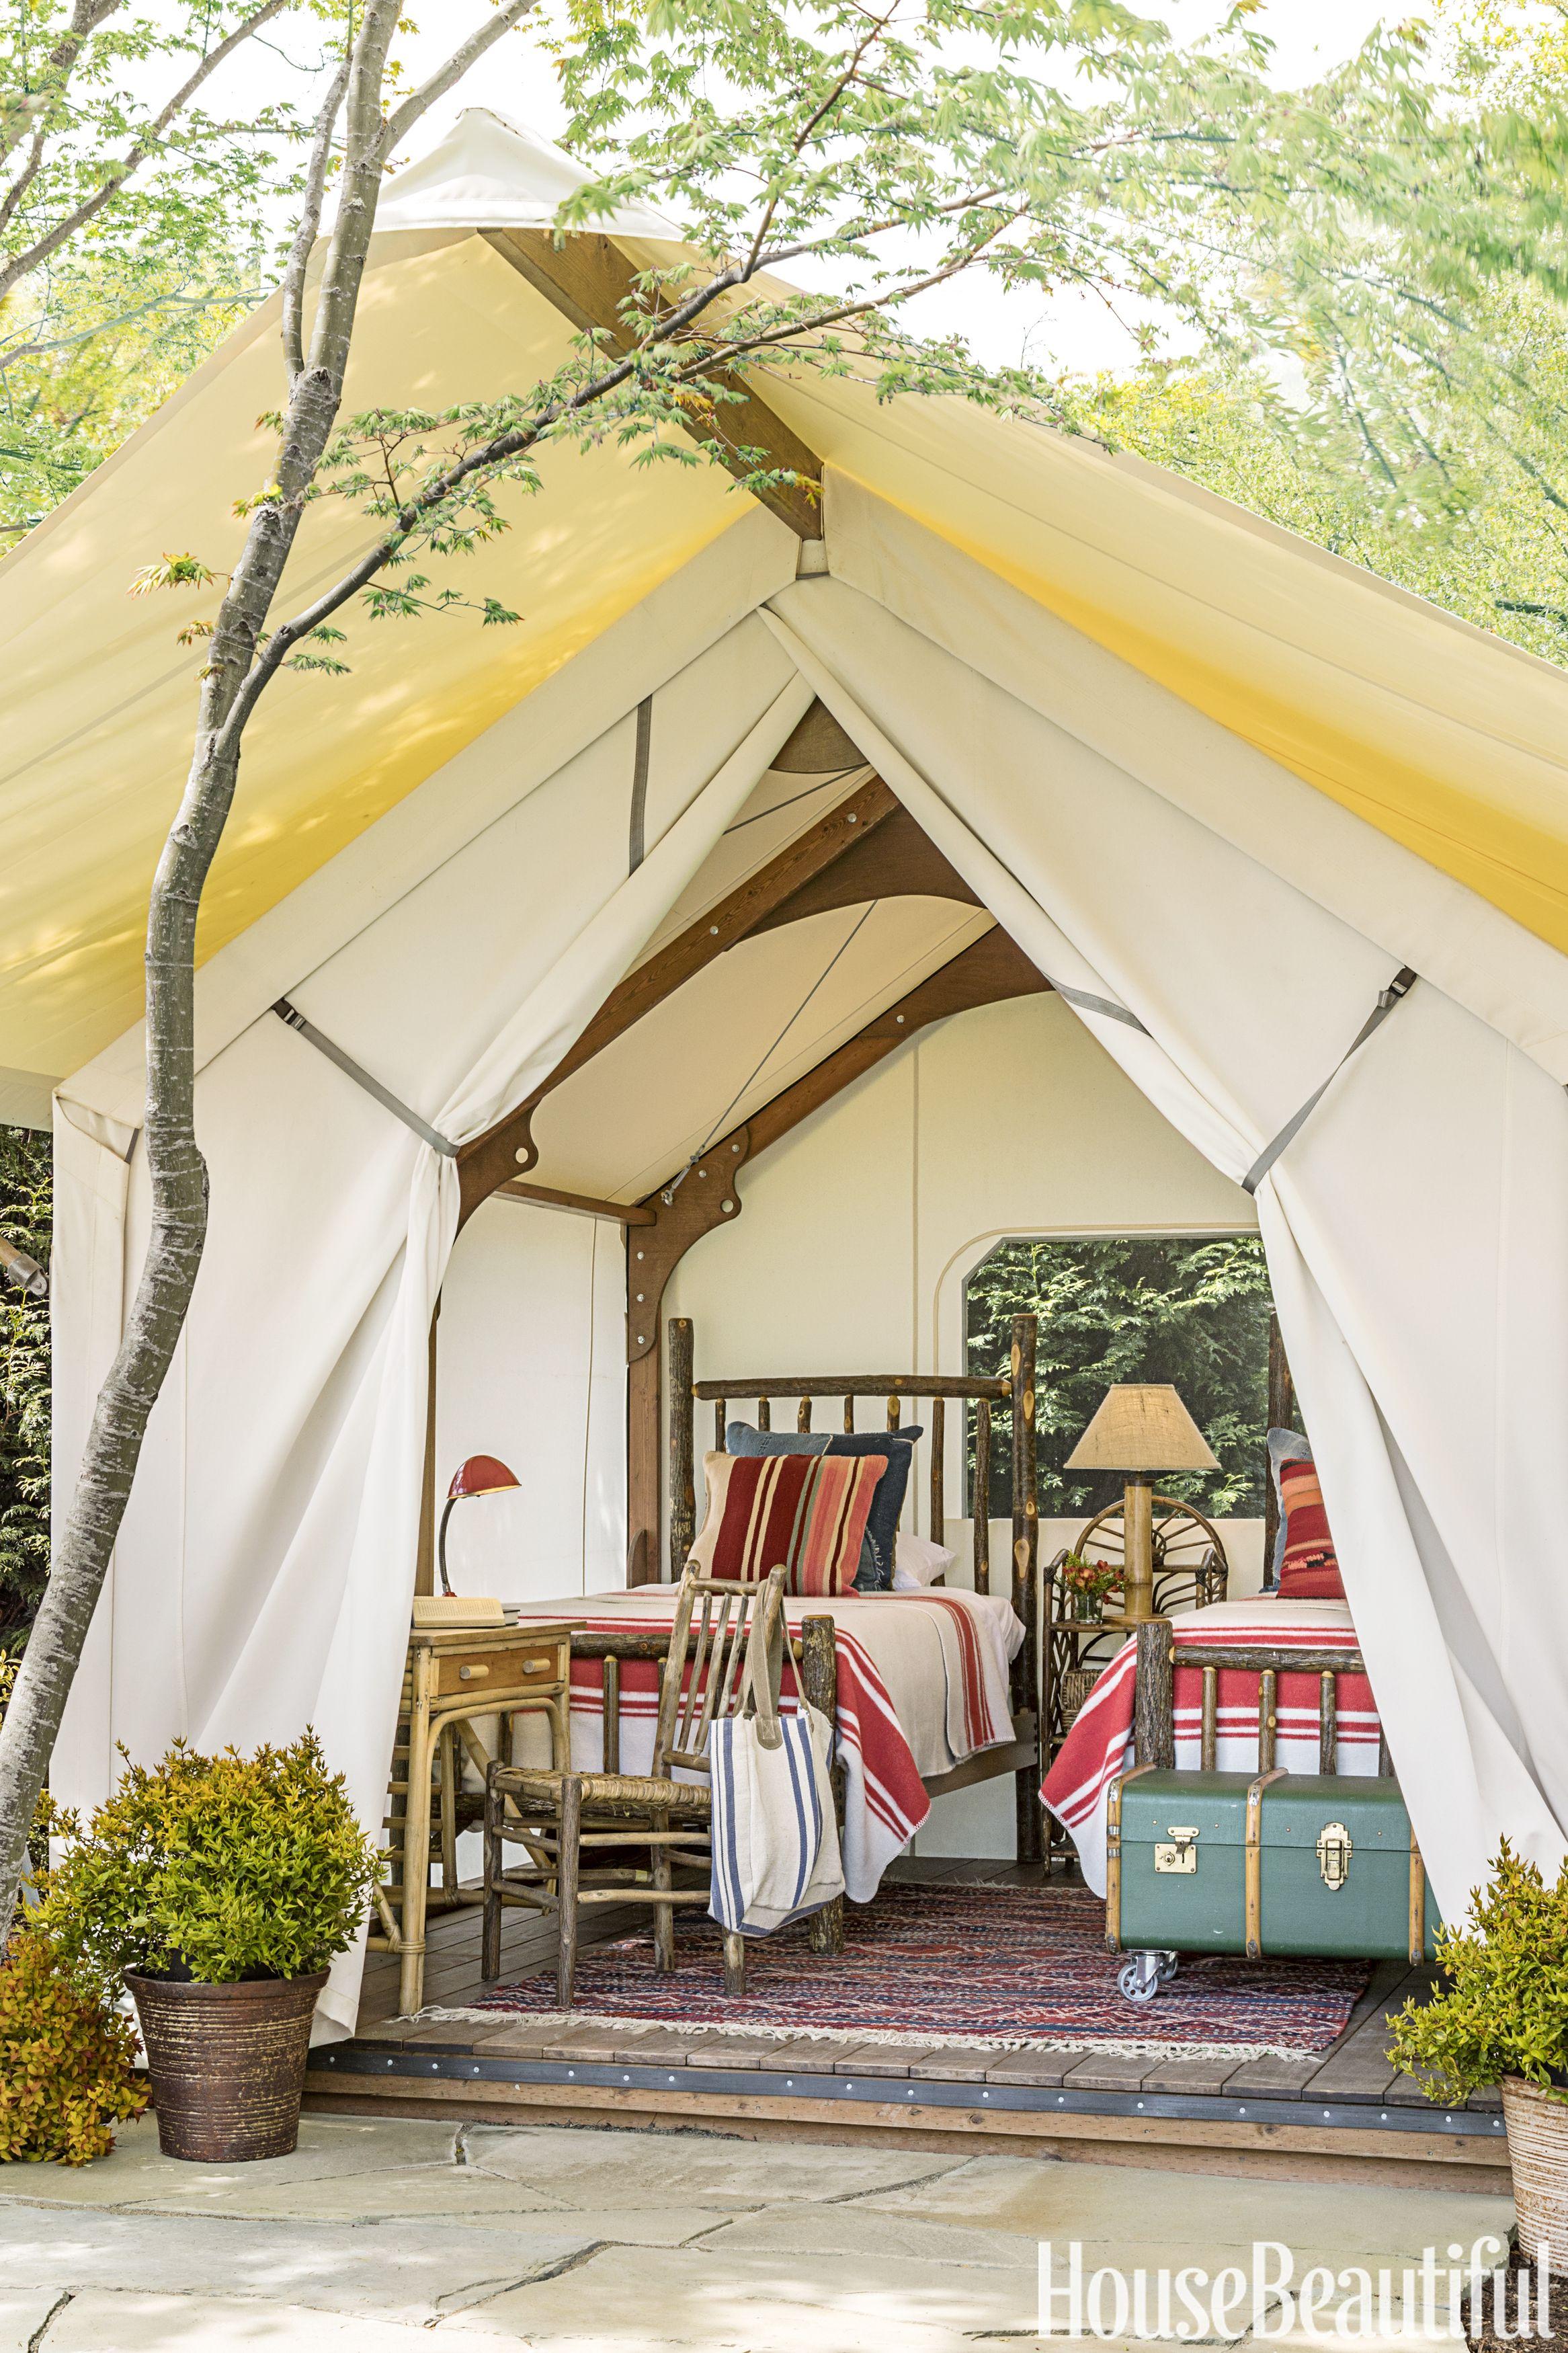 Tent Bedroom Steve Hoedemaker And Tim Pfeiffer